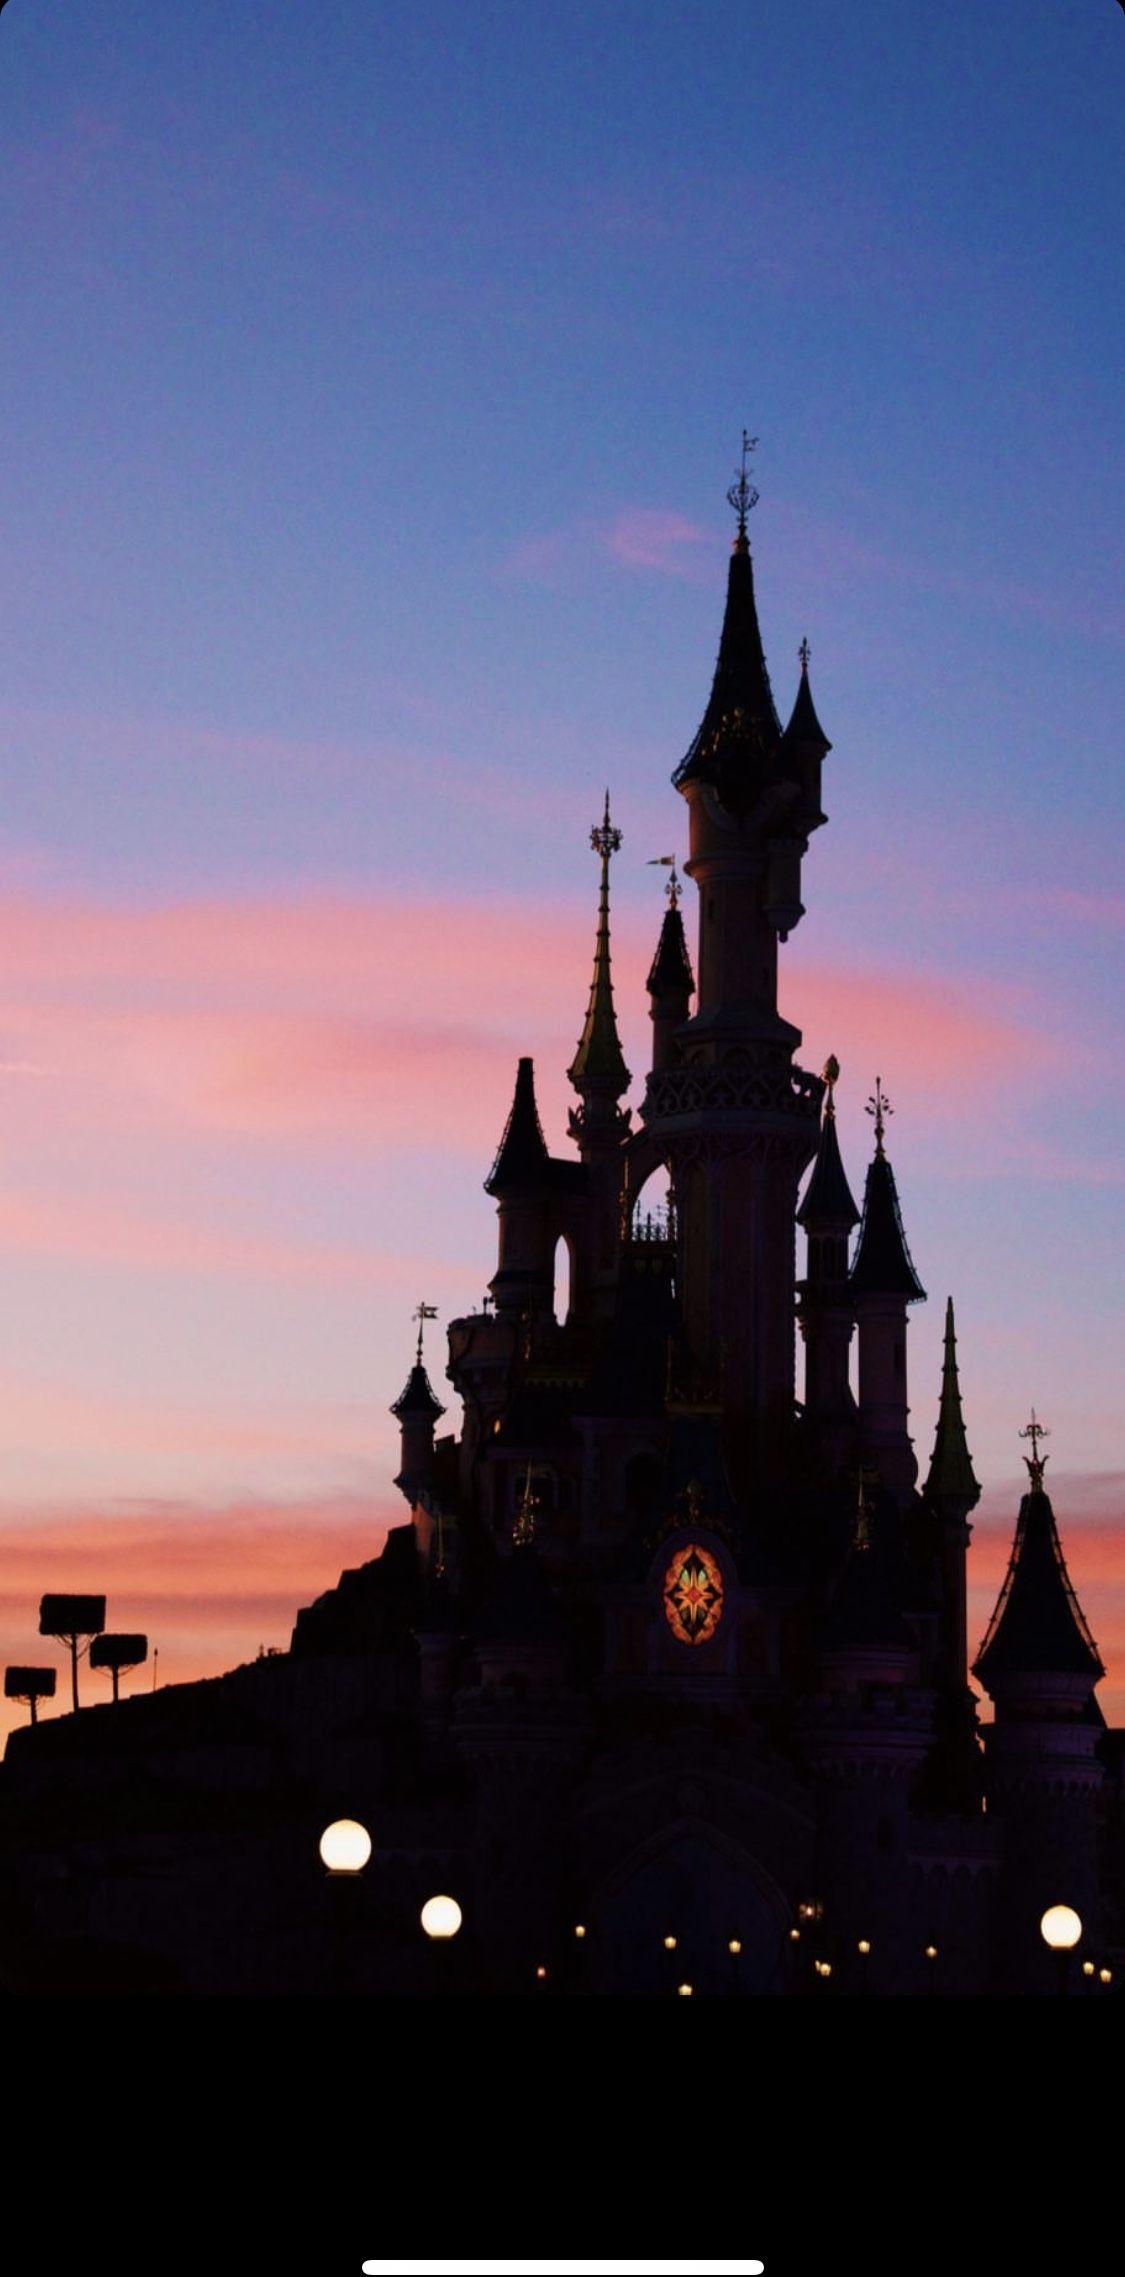 Taken by Allison Schaper Disneyland paris, Paris